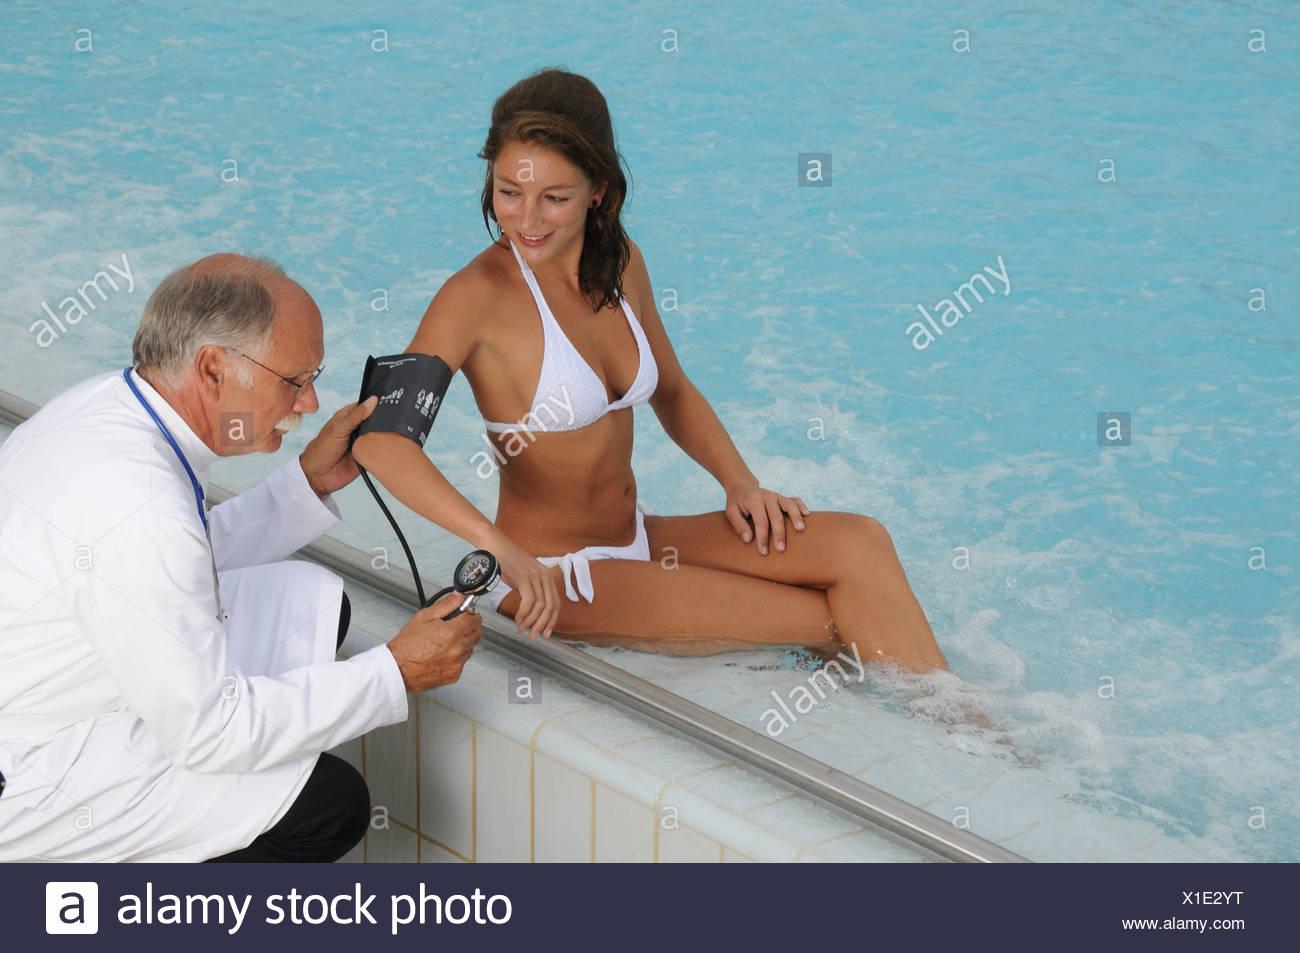 Wellness, bath, doctor, treatment, processing, health, Beauty farm, investigation, woman, swimming-pool, pool, blood pressure - Stock Image